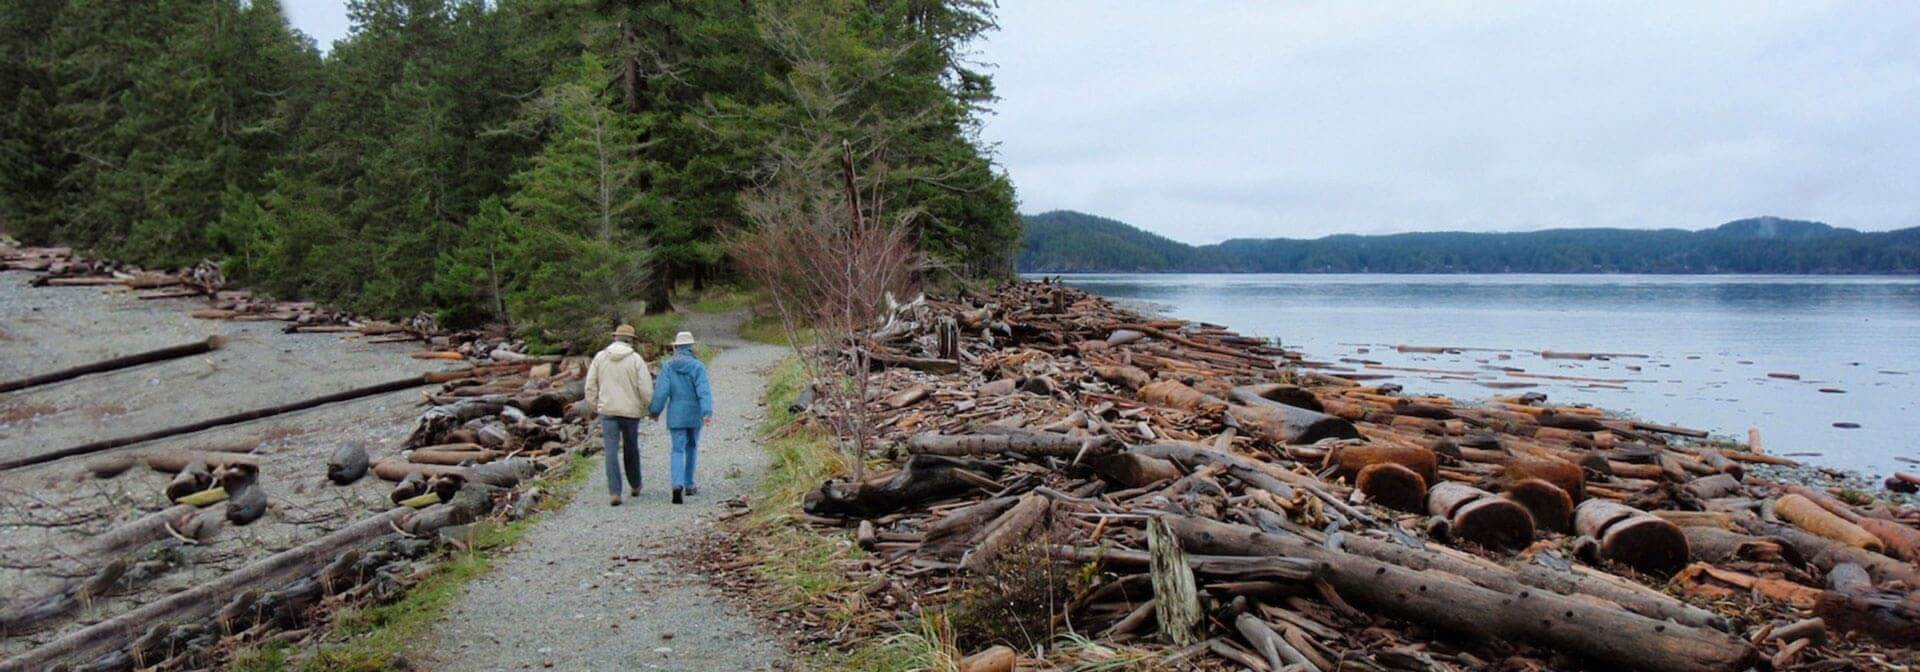 Couple walking through Quadra Island